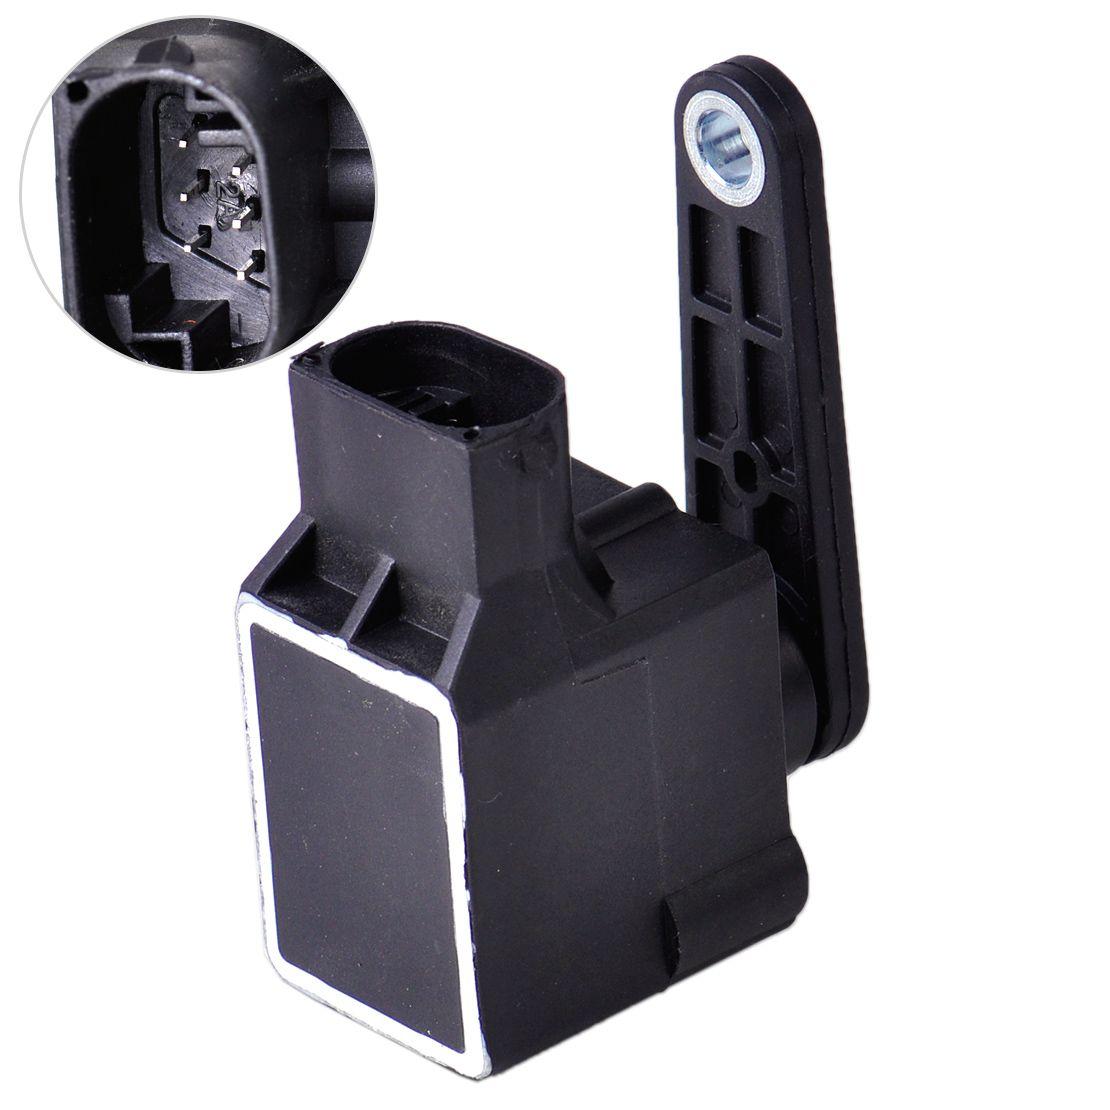 DWCX New Headlight Level Range Control Sensor 4B0907503 4B0 907 503 4B0907503A for Audi A3 A4 A6 A8 TT VW Bora Passat Golf IV